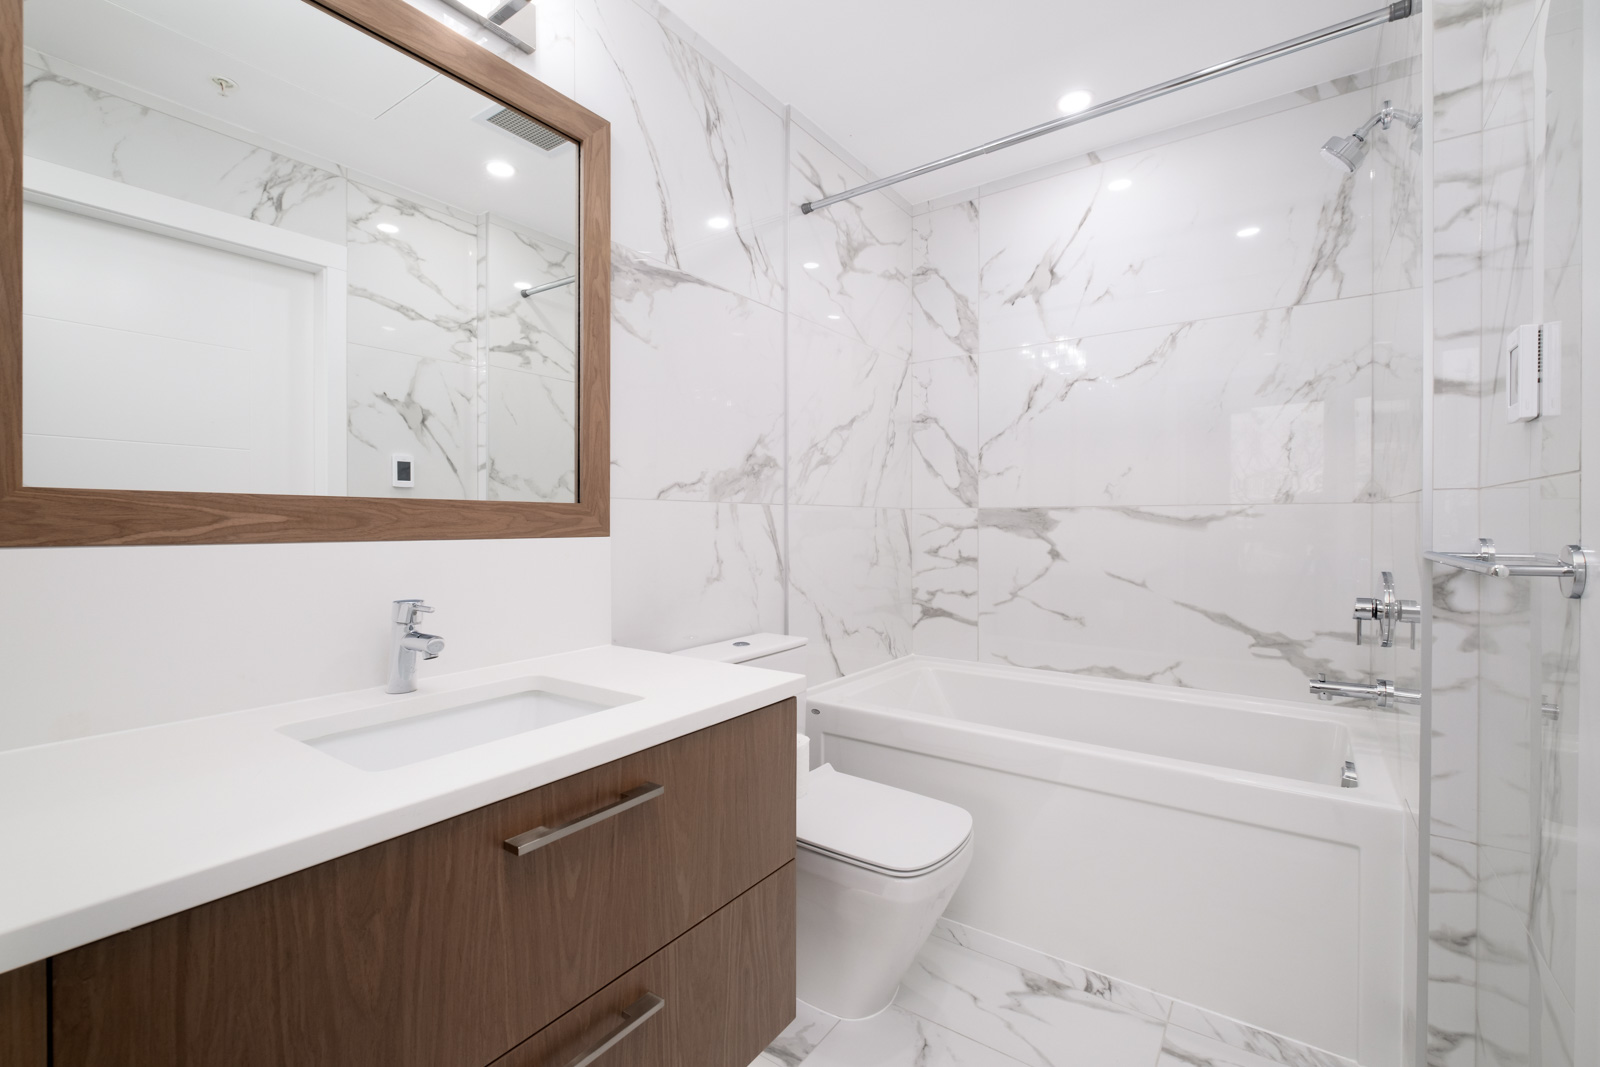 Bathroom with white walls and bath tub